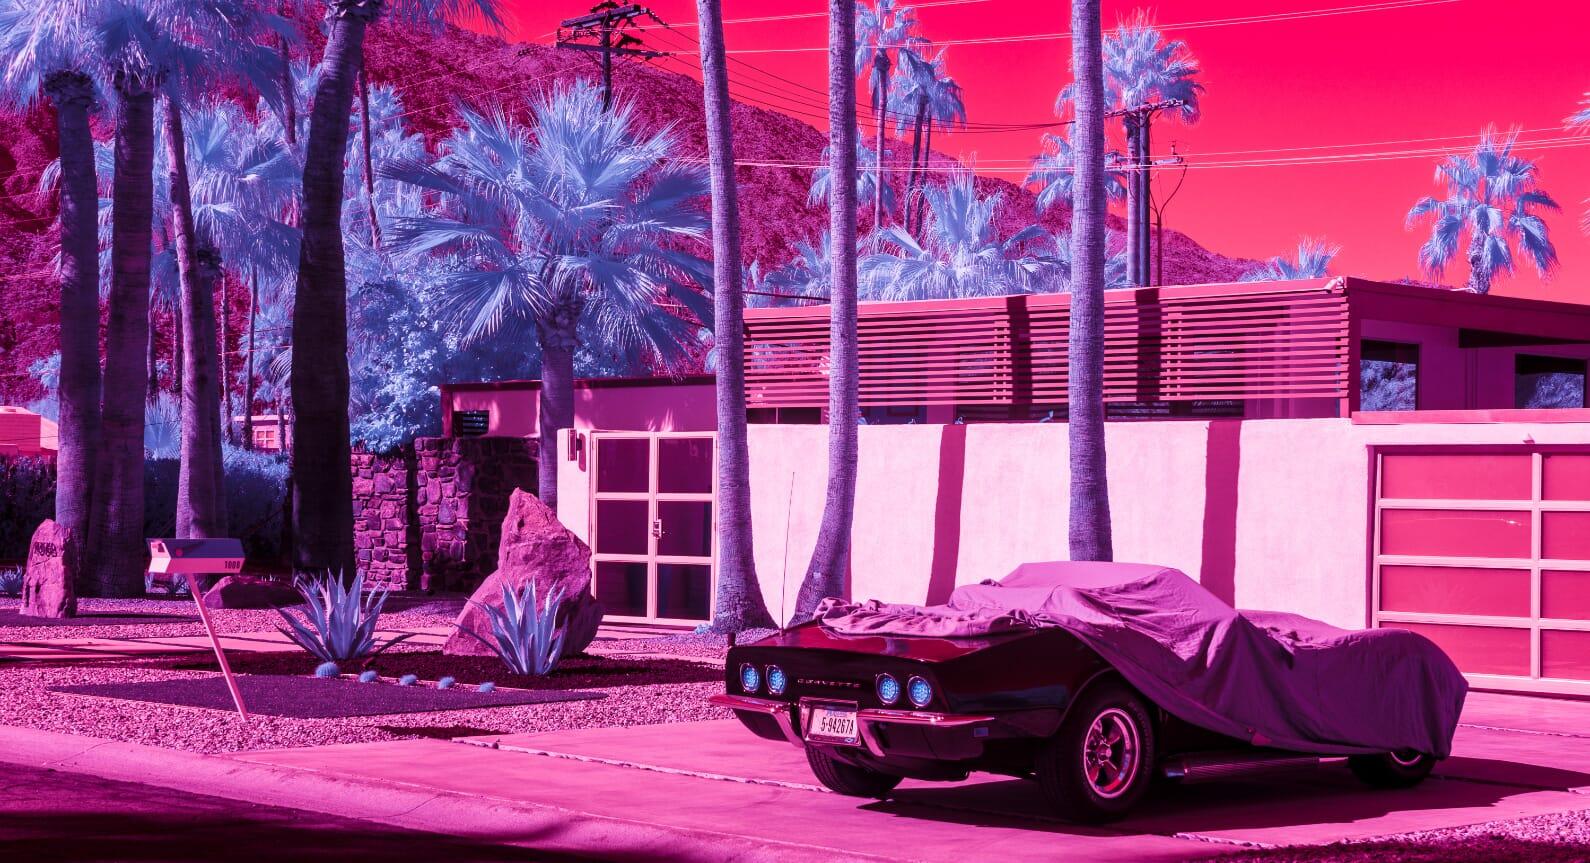 Infra Realism: Kate Ballis Reimagines California's Modernist Landscape With Infared